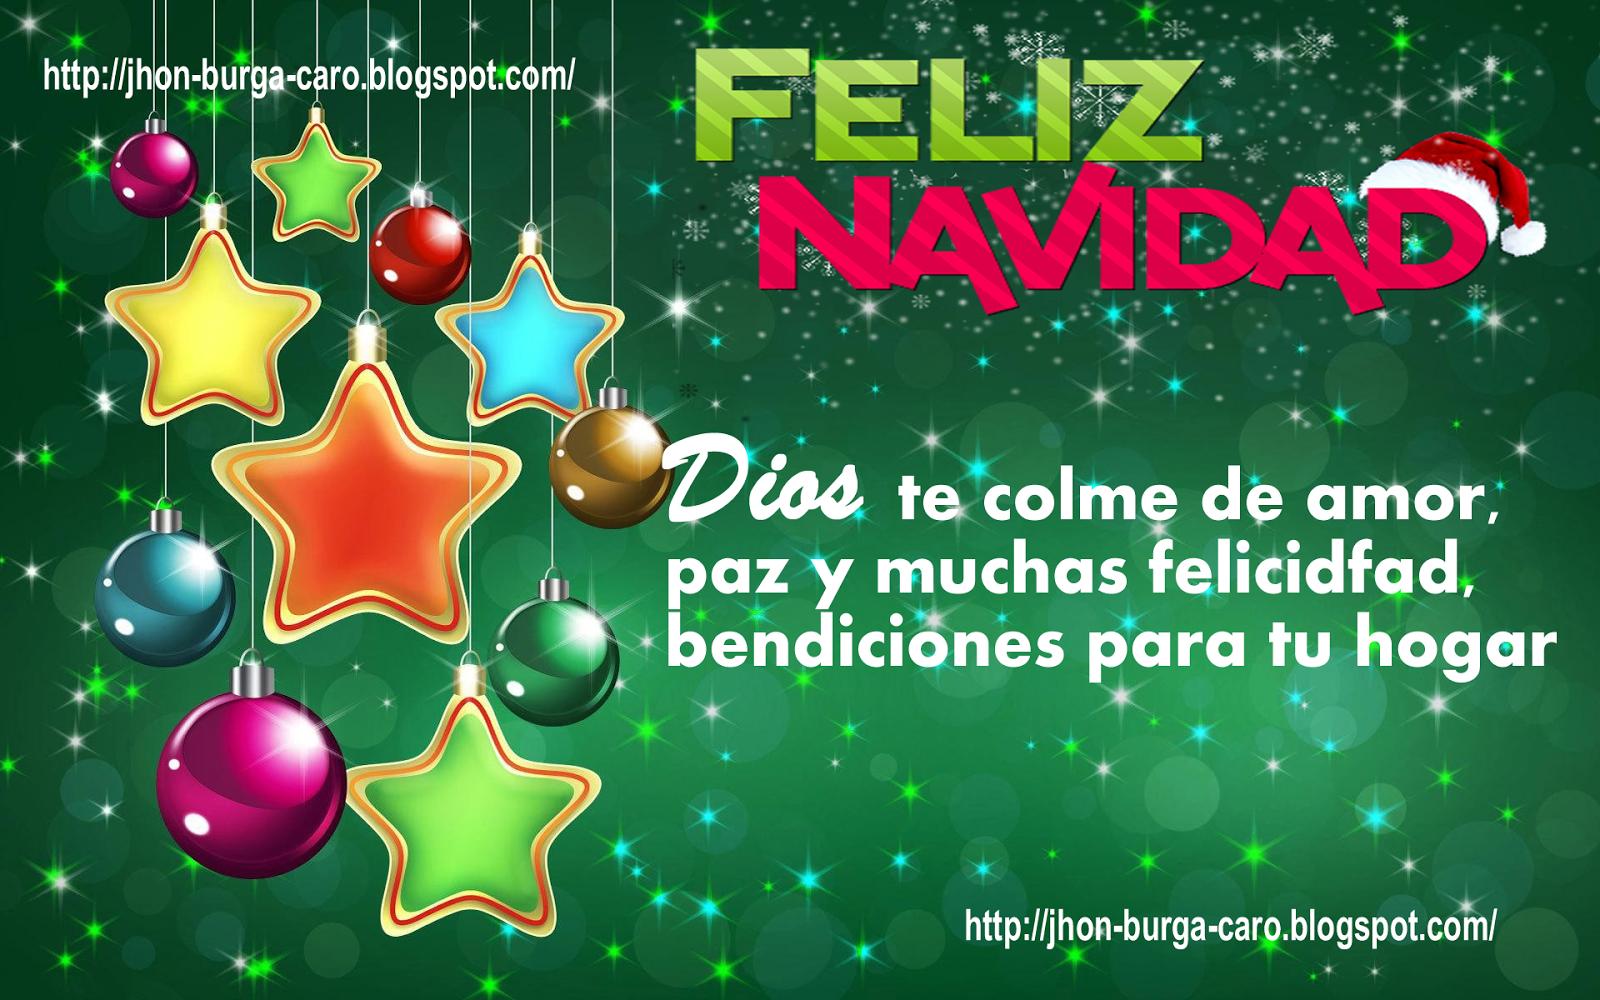 Feliz navidad tarjetas cristianas gratis - Tarjetas navidenas cristianas ...